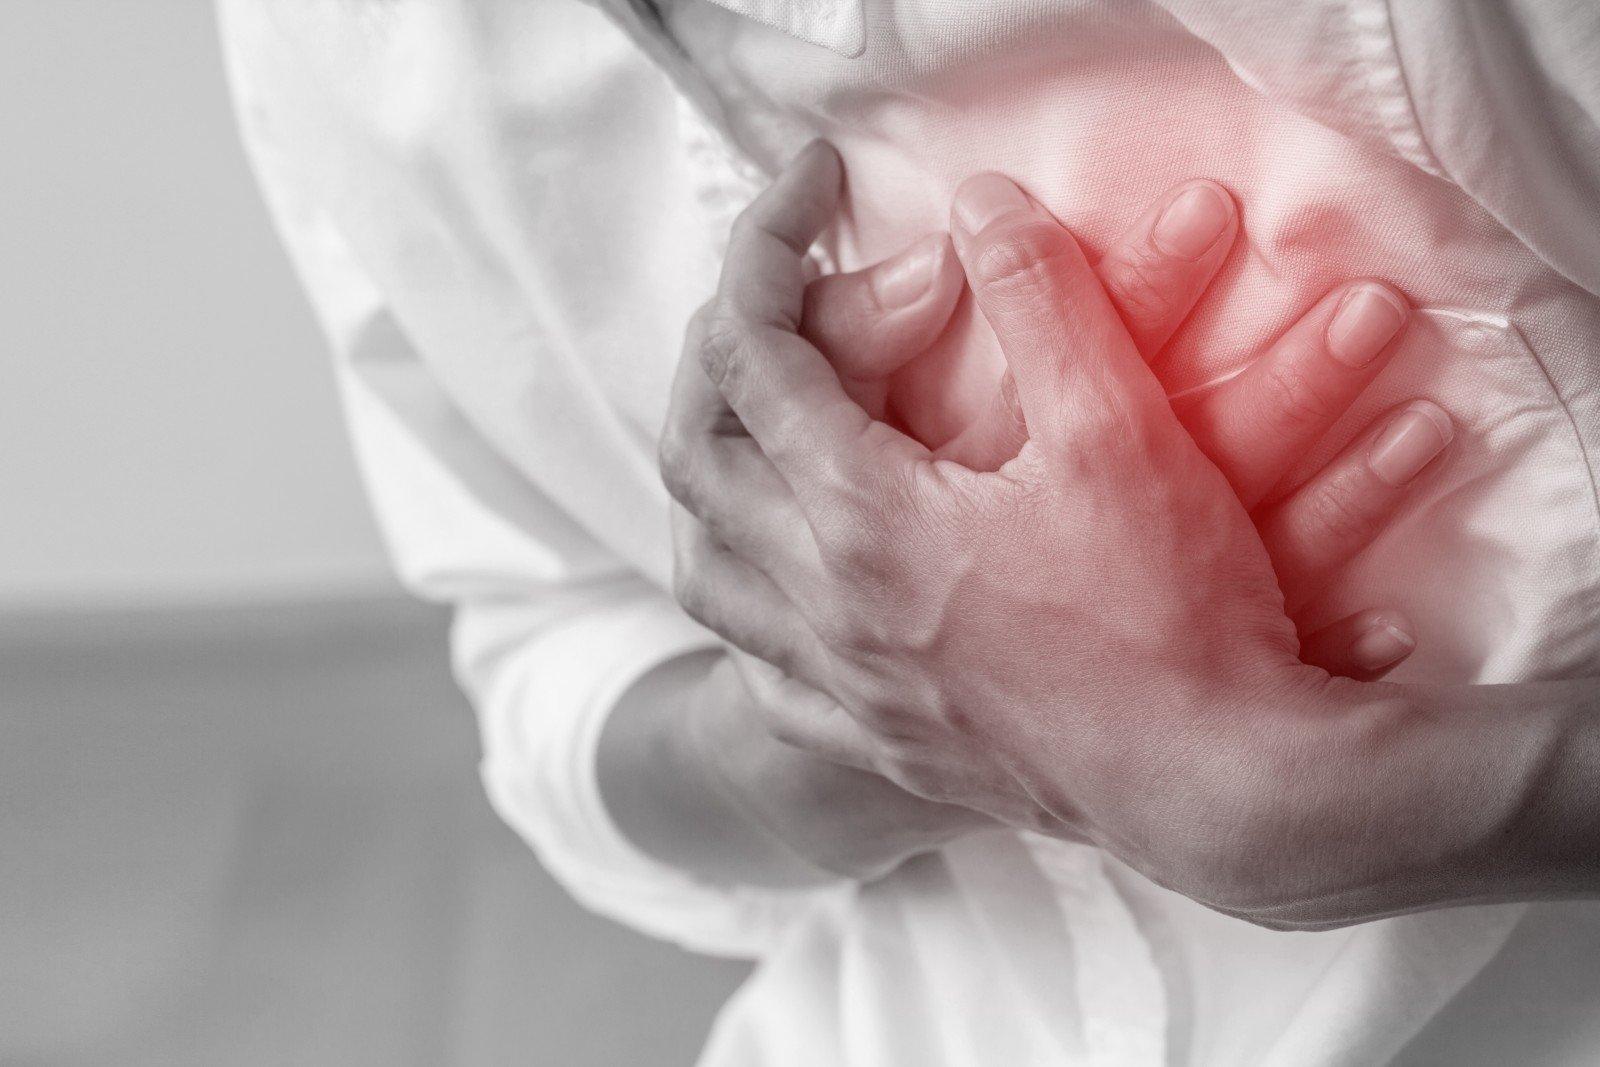 širdies sveikatos problemų simptomai